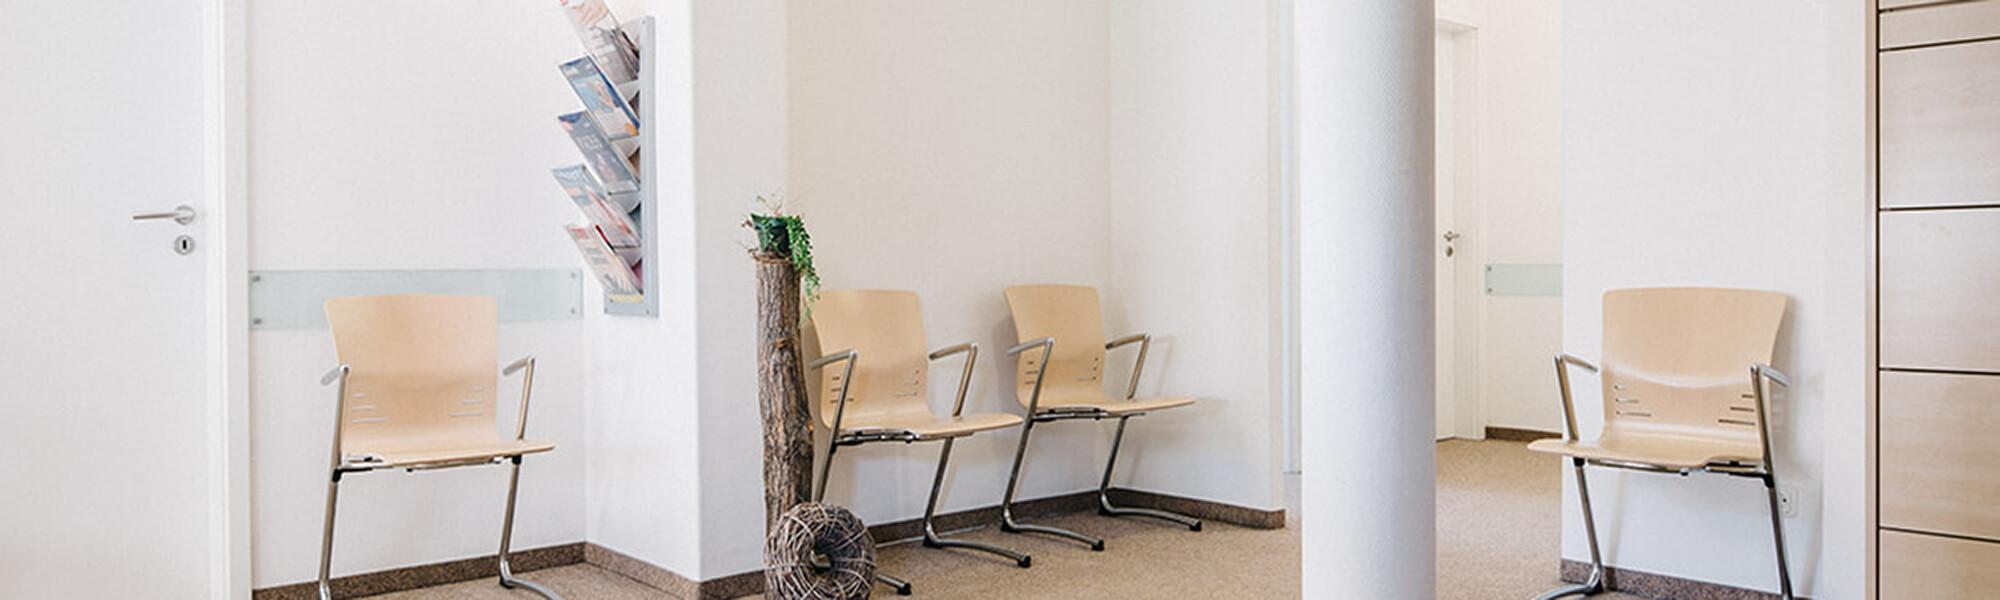 Hausarzt Partenkirchen - Dr. Kainz - Praxis Slider